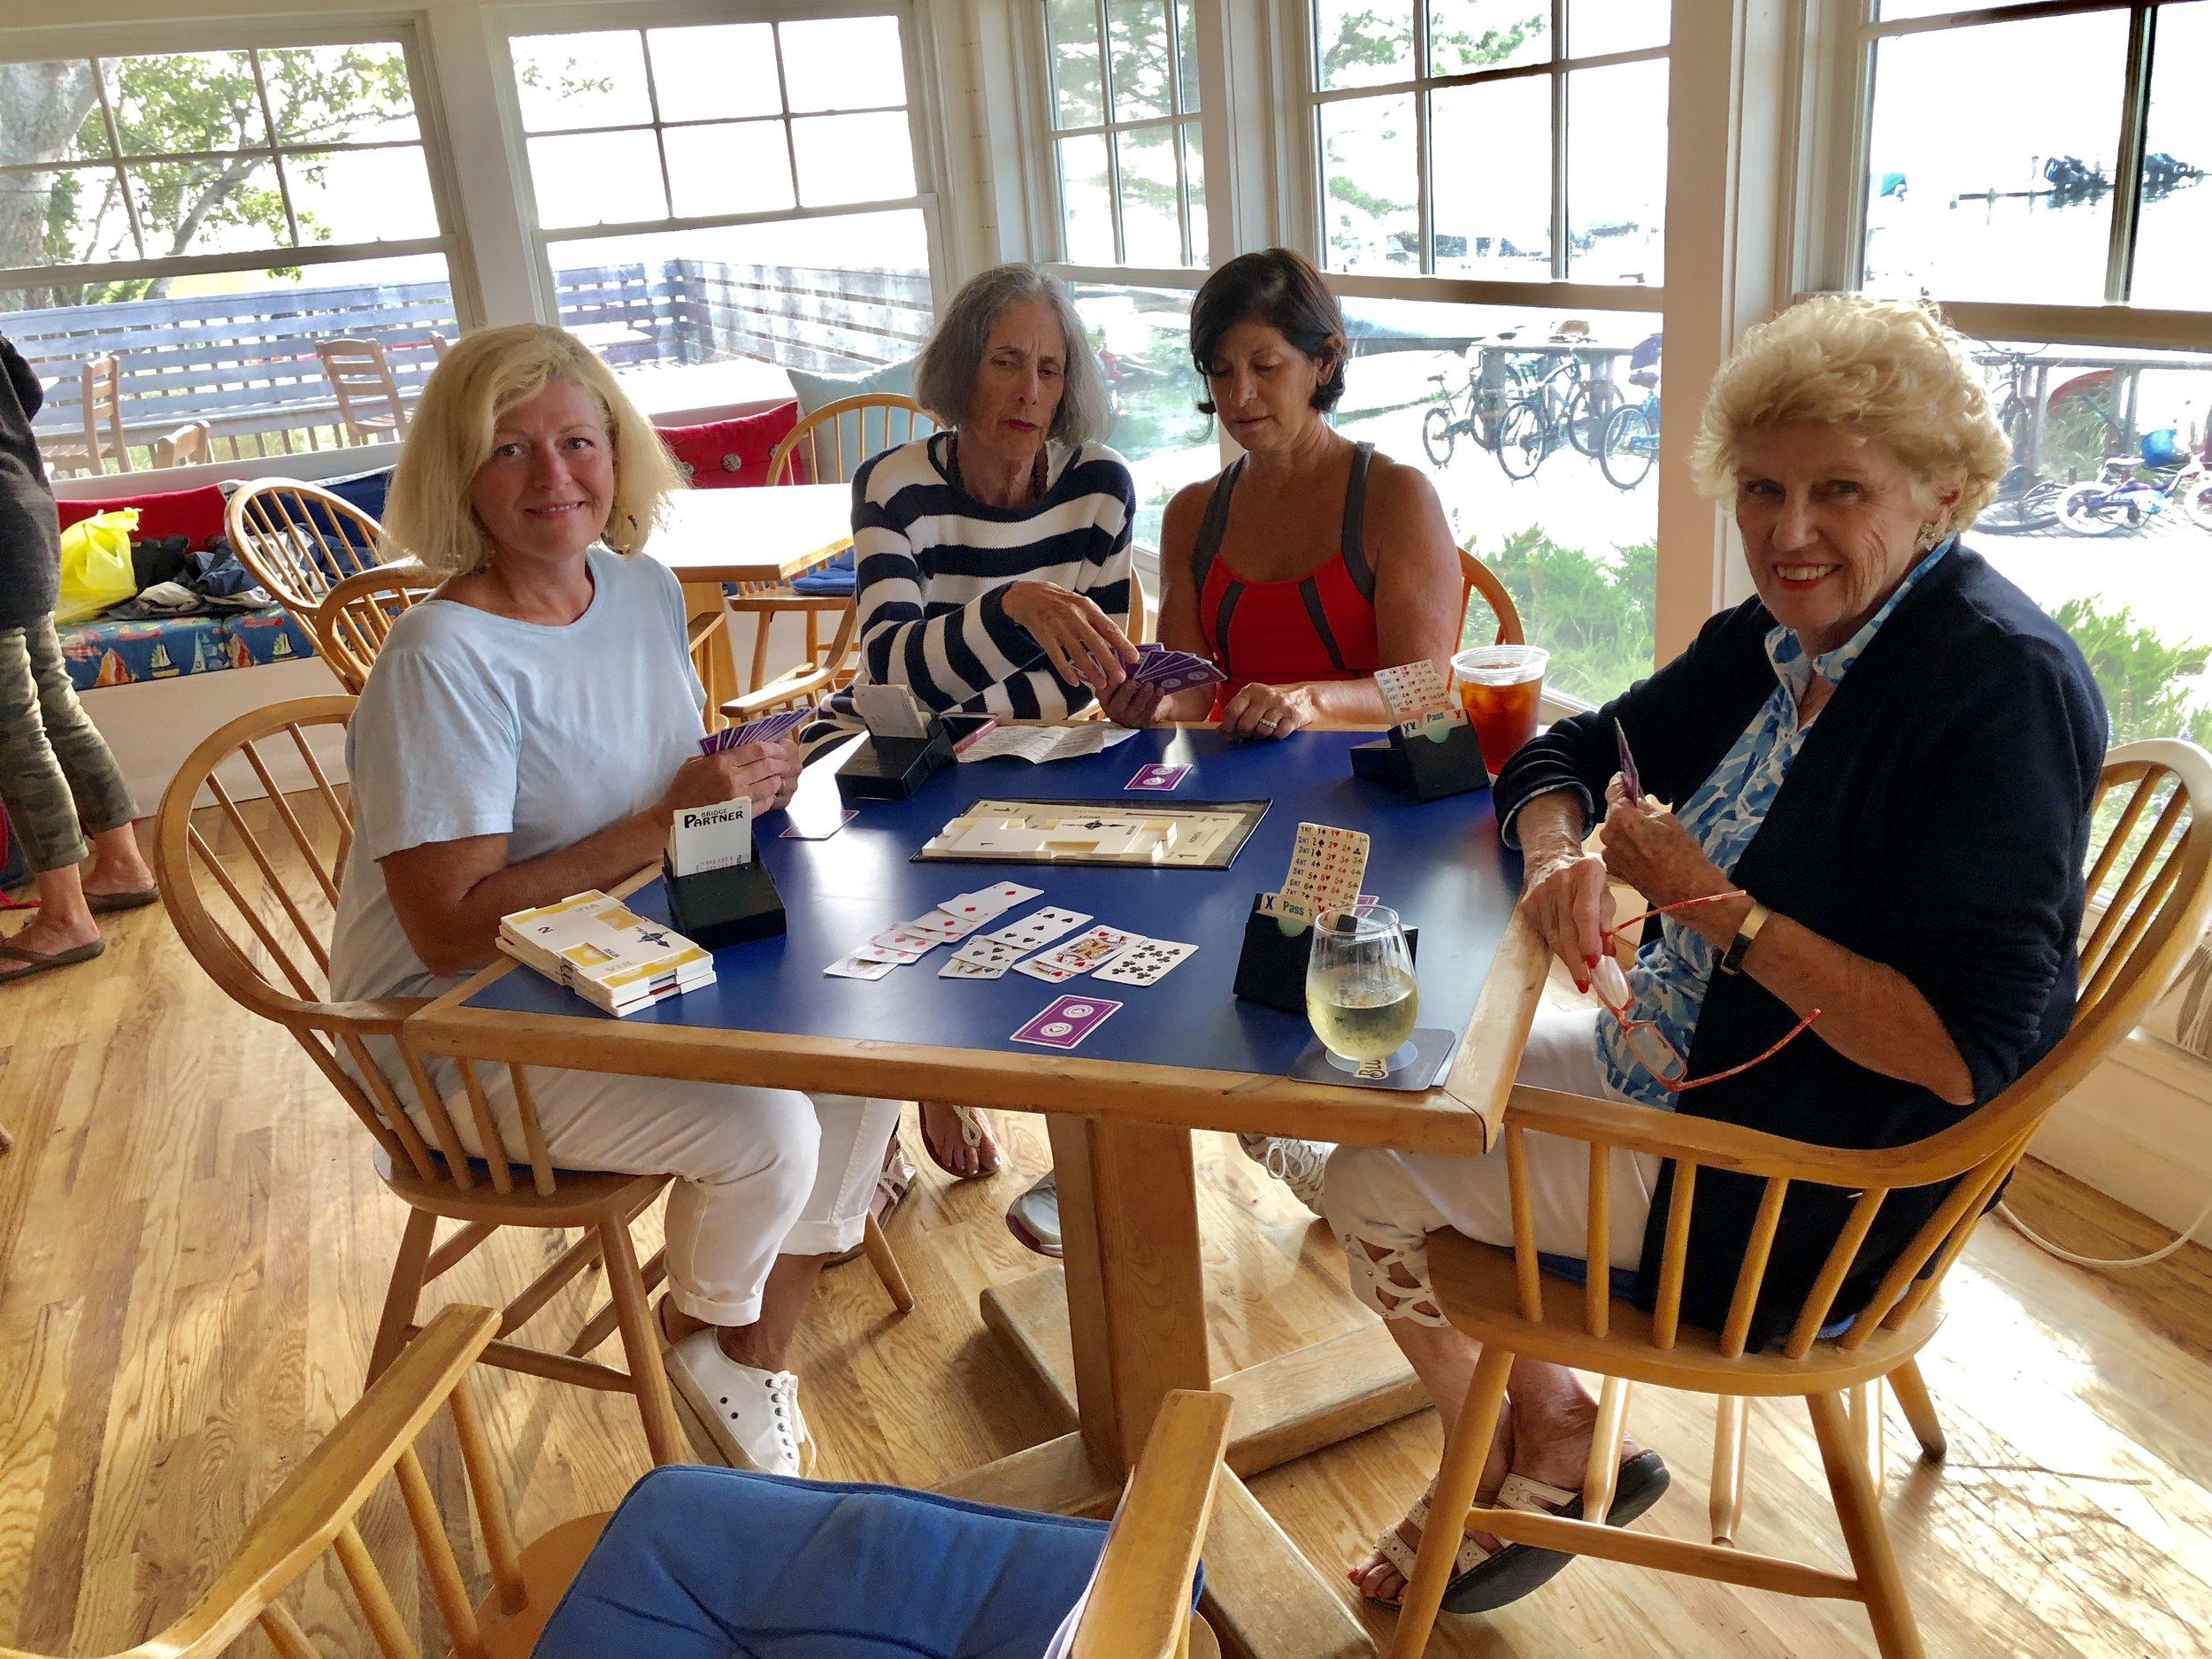 Bridge - Kathleen Coffey, Carole Sirovich (instructor), Lilli Diller, Lorraine Connolley